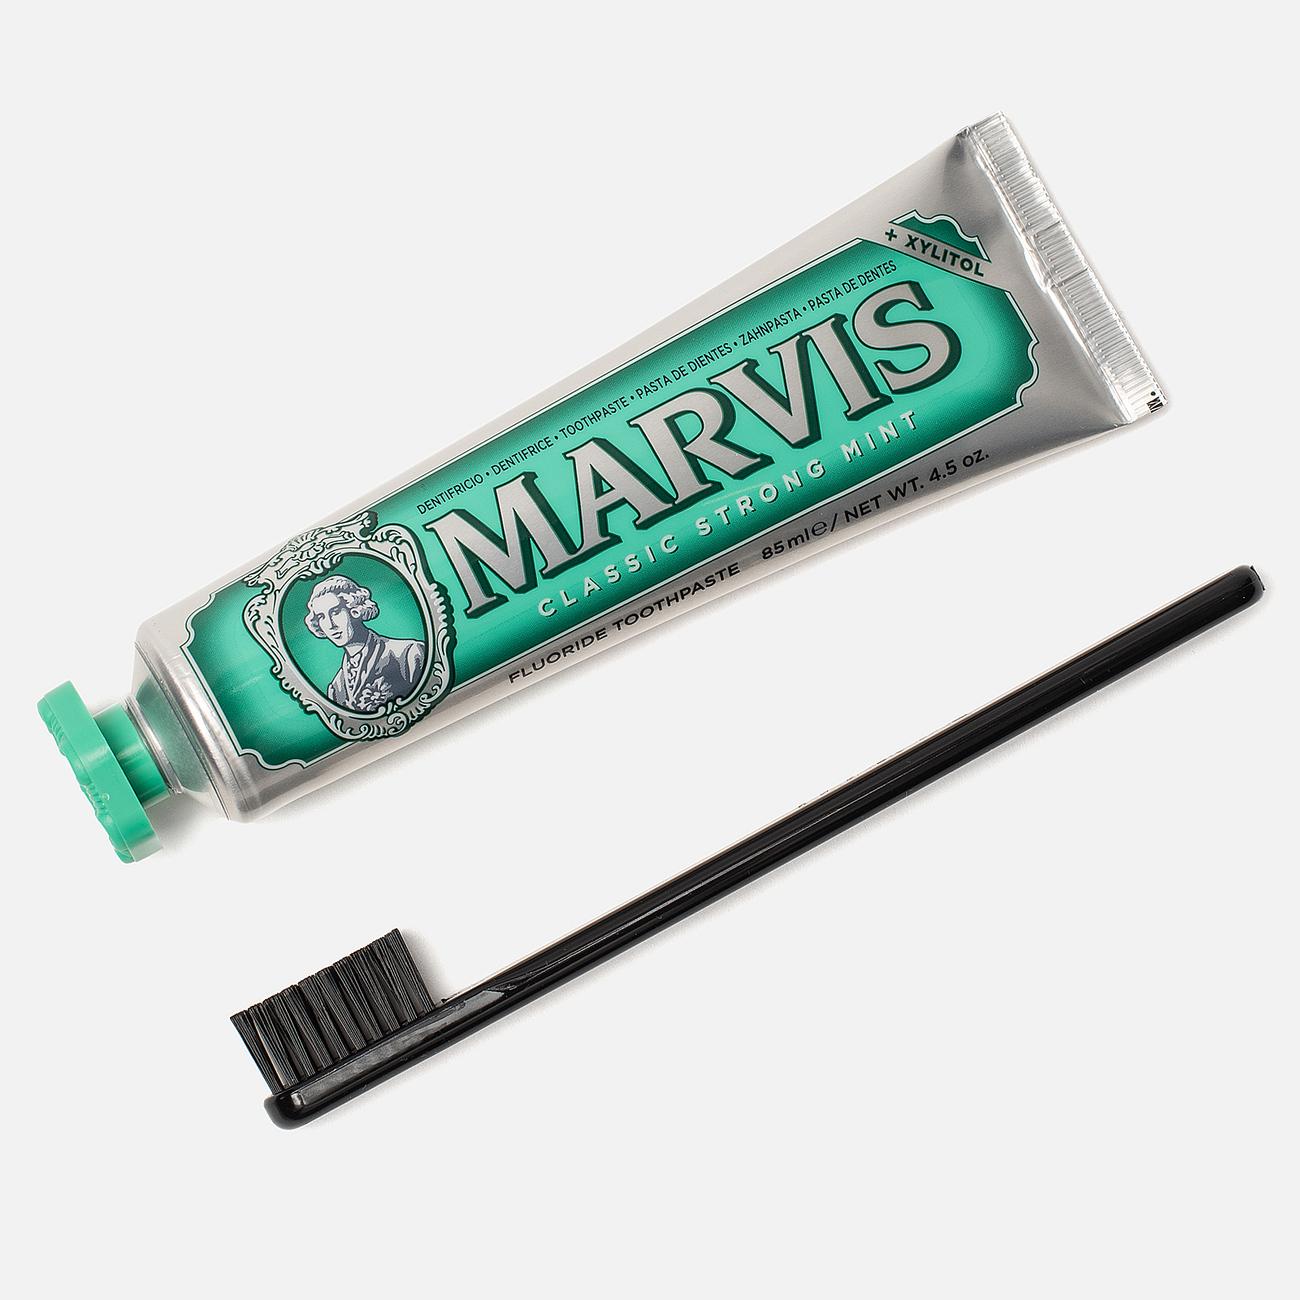 Дорожный набор Marvis Medium Nylon Toothbrush And Classic Strong Mint + XYLITOL 85ml